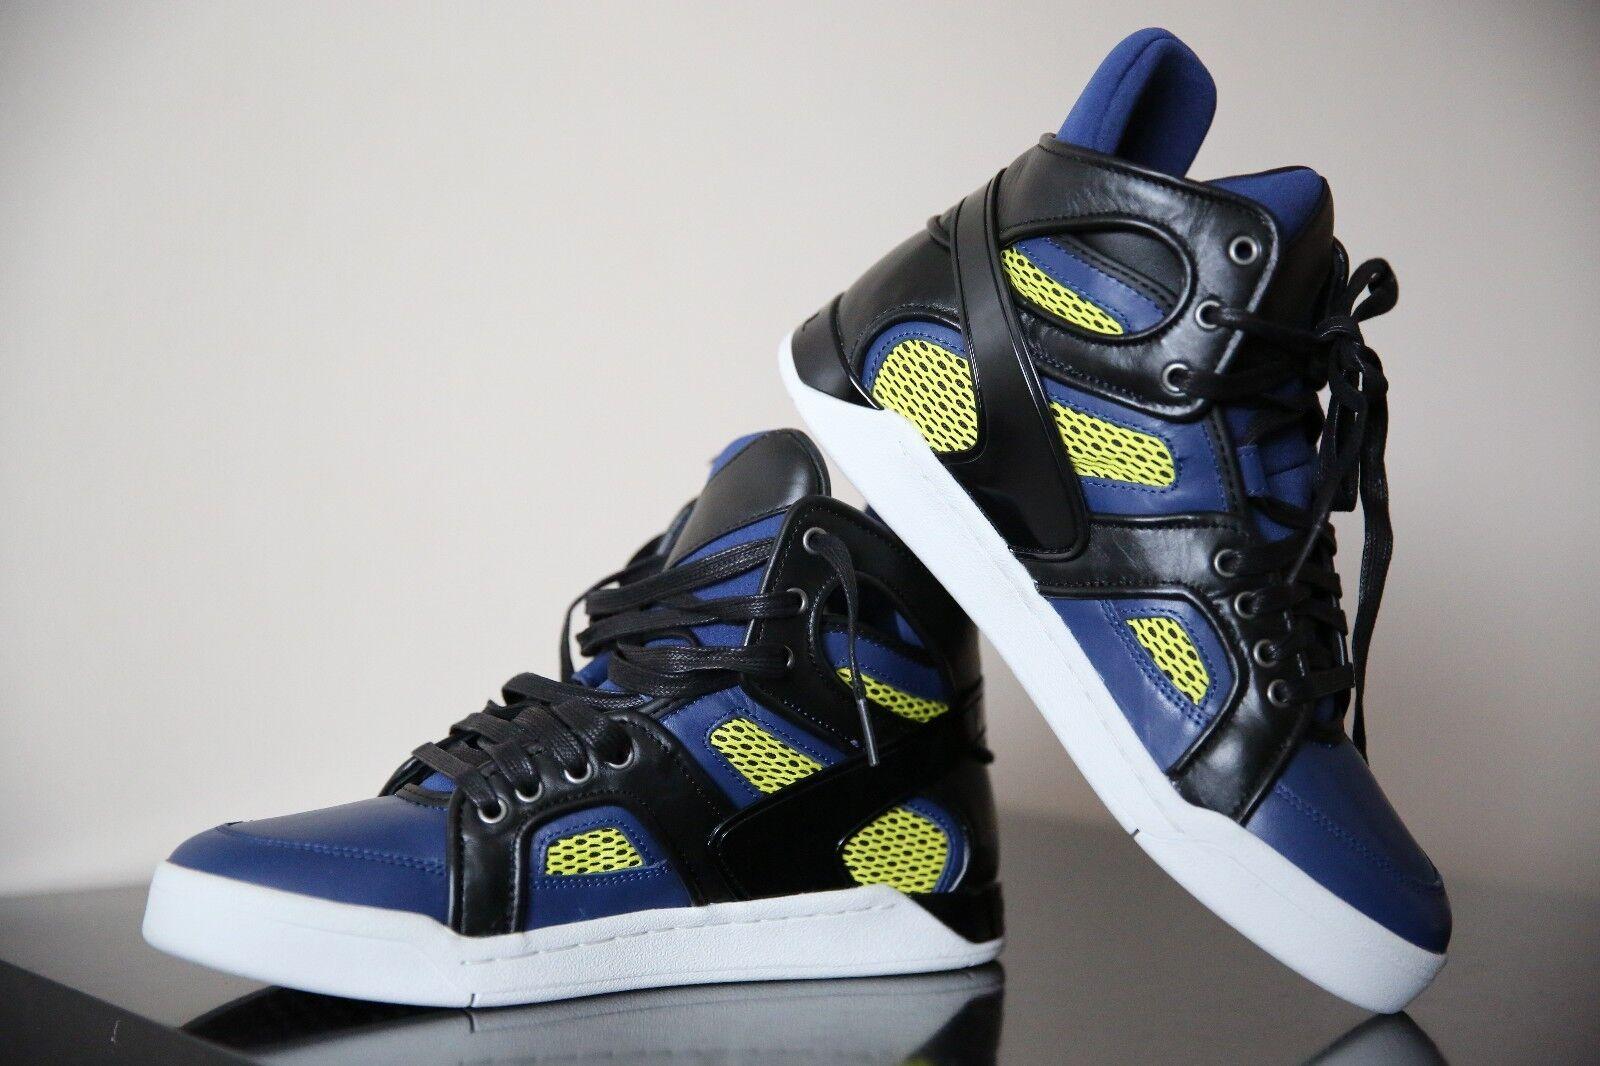 bc808fd70f6 Diesel S-Titann Men bluee bluee bluee Black Yellow shoes Size UK 8 EUR 42  ...